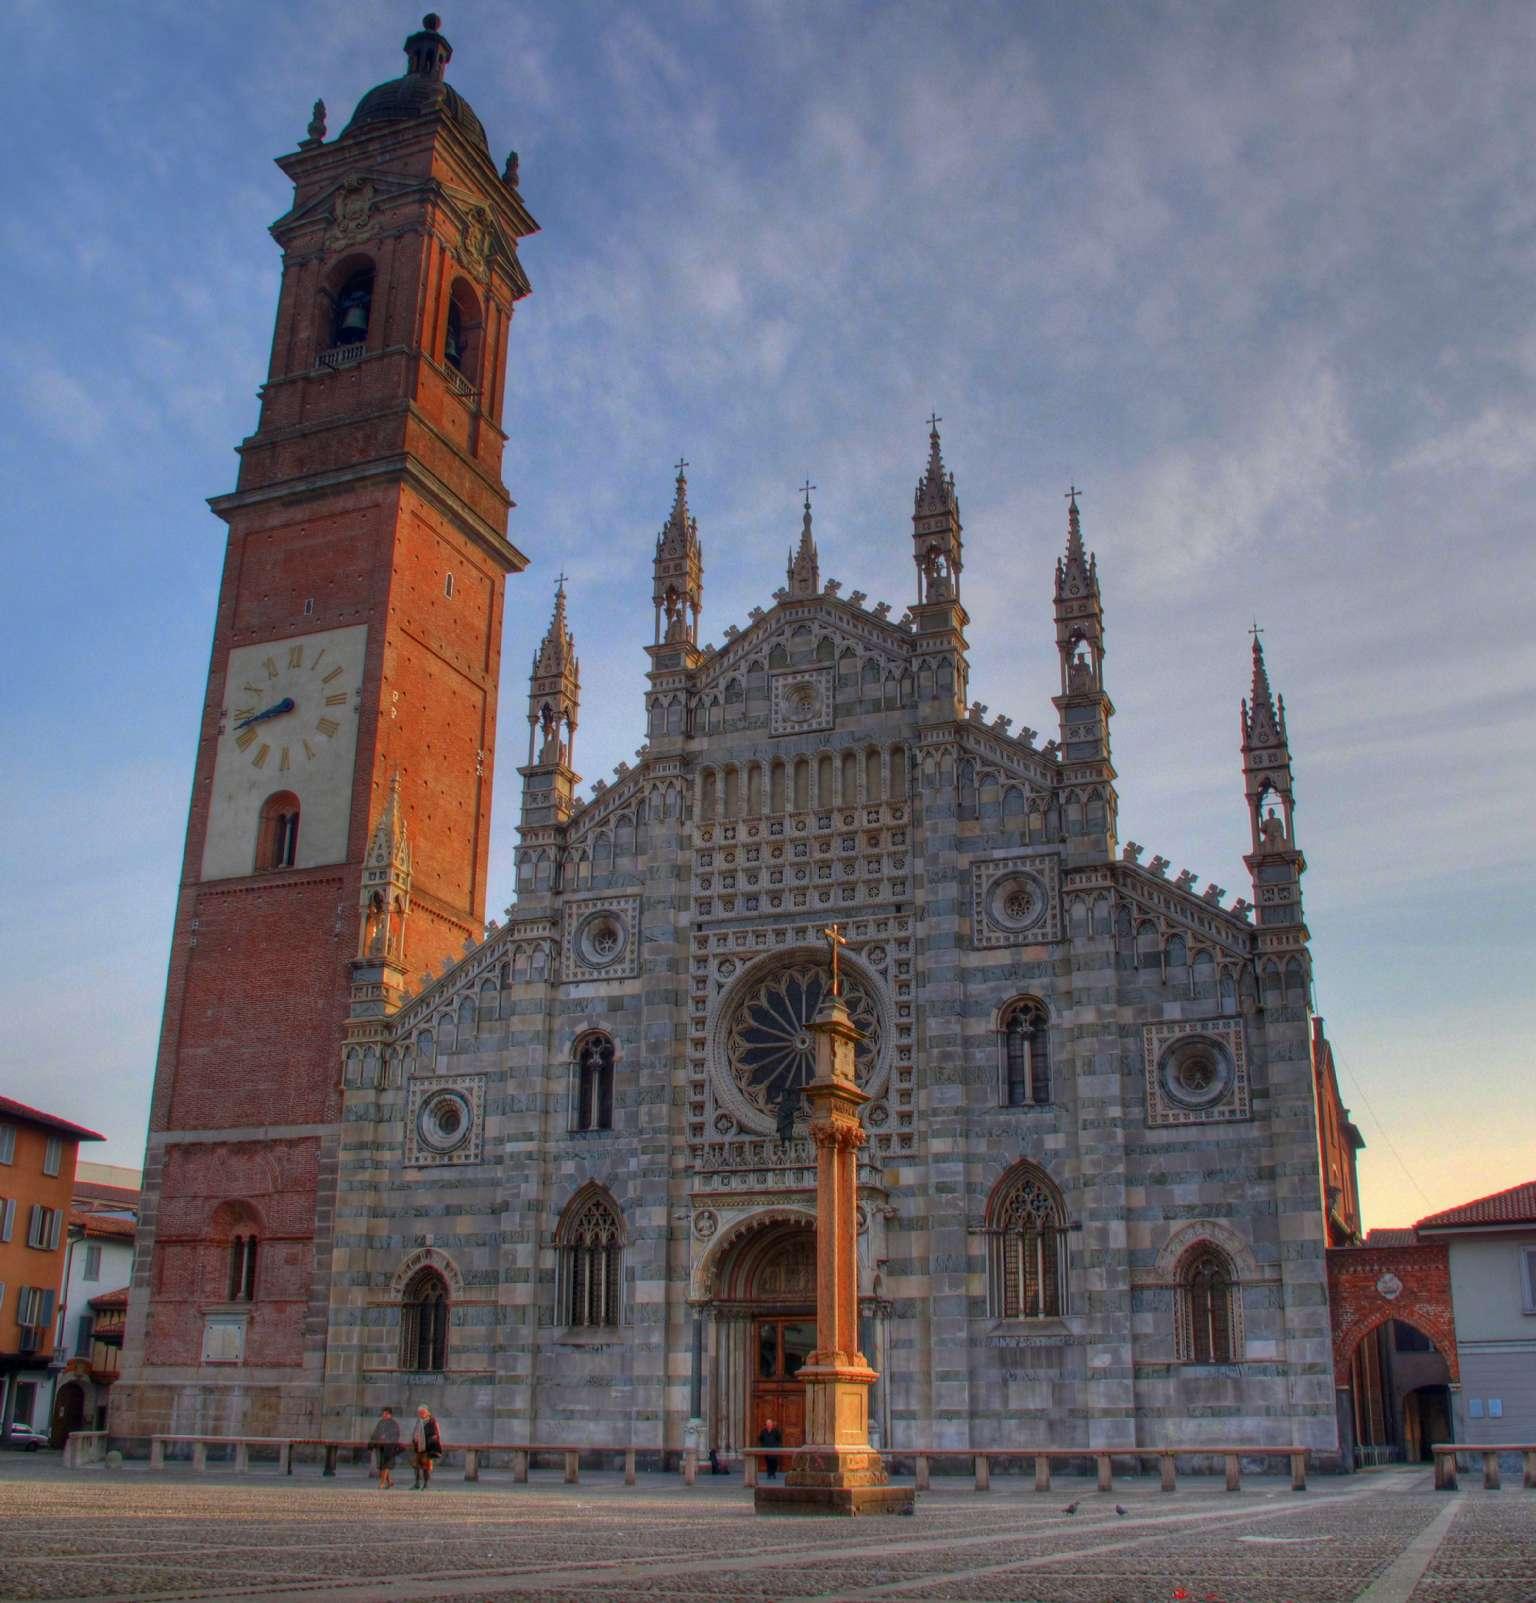 Bilocale Monza Natale Lucca 4